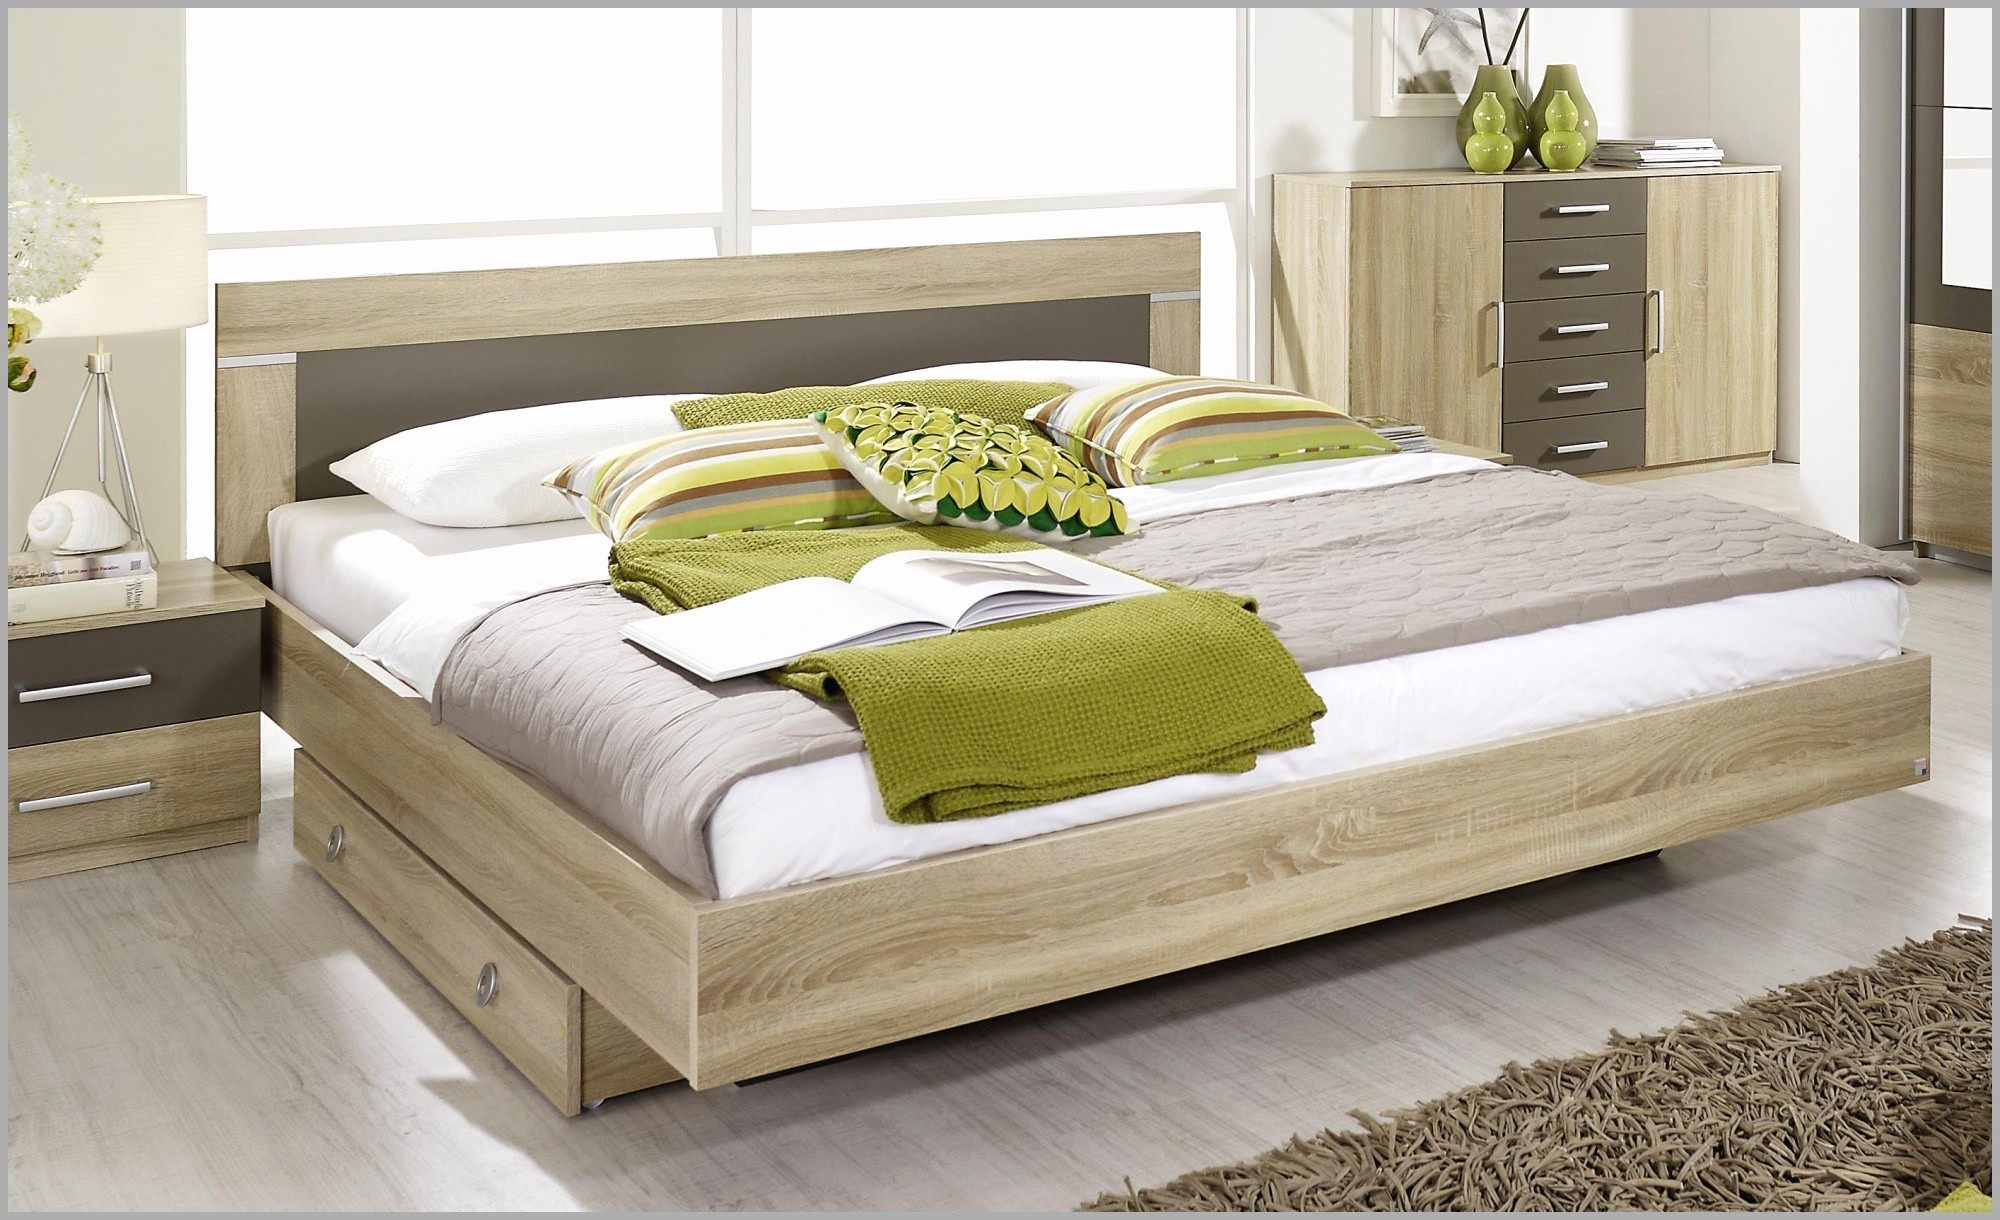 Tissu Tete De Lit Génial Tete De Lit 200 Tissu Tete De Lit Ikea 180 Fauteuil Salon Ikea Fresh